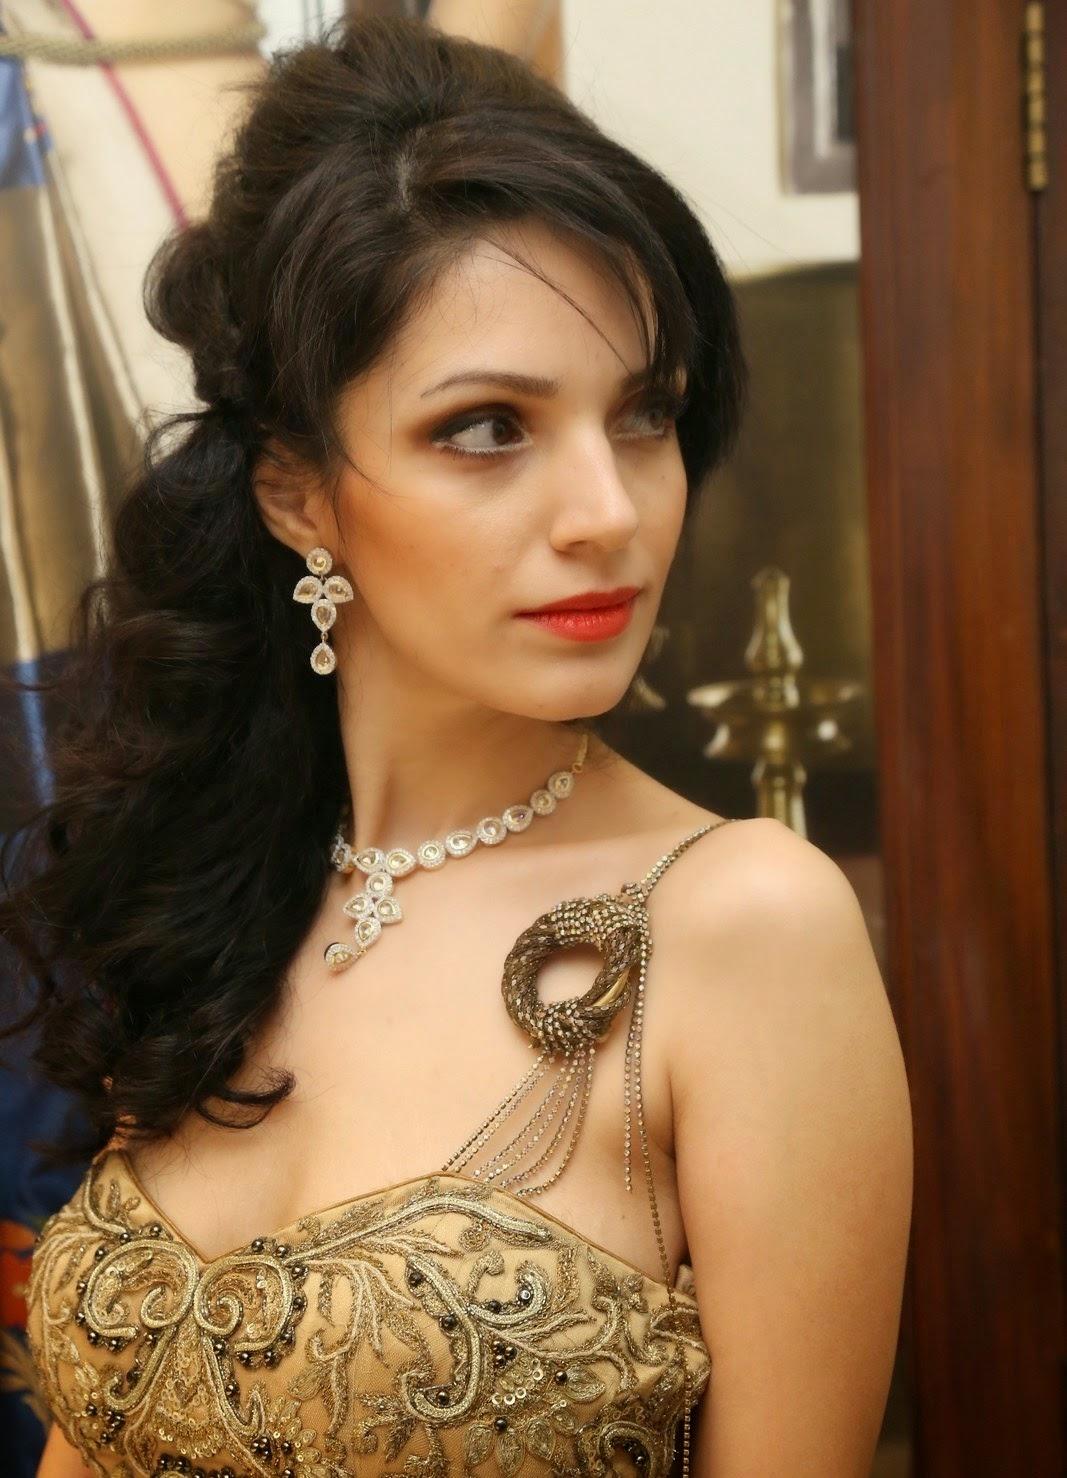 Cleavage Clara Bindi nude (49 photo) Hot, Facebook, braless